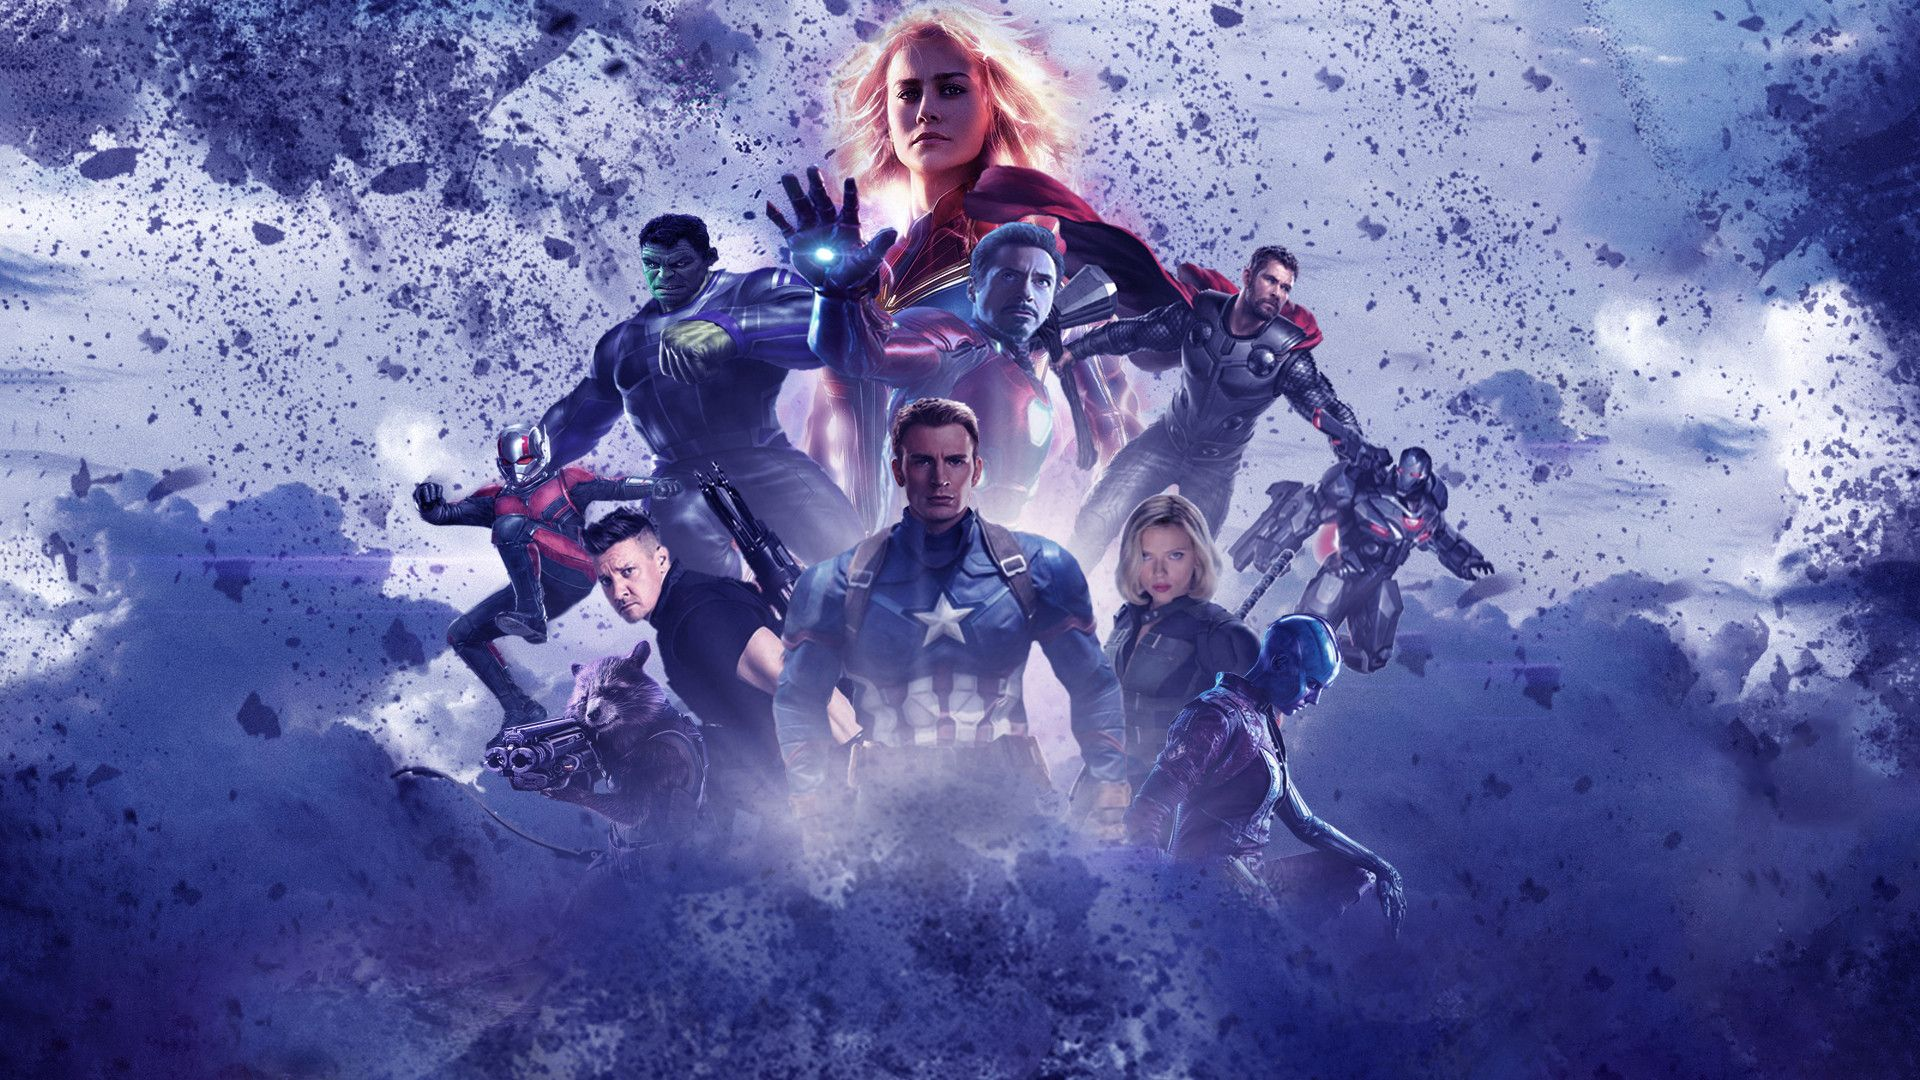 Avengers Endgame Hd Wallpaper Download